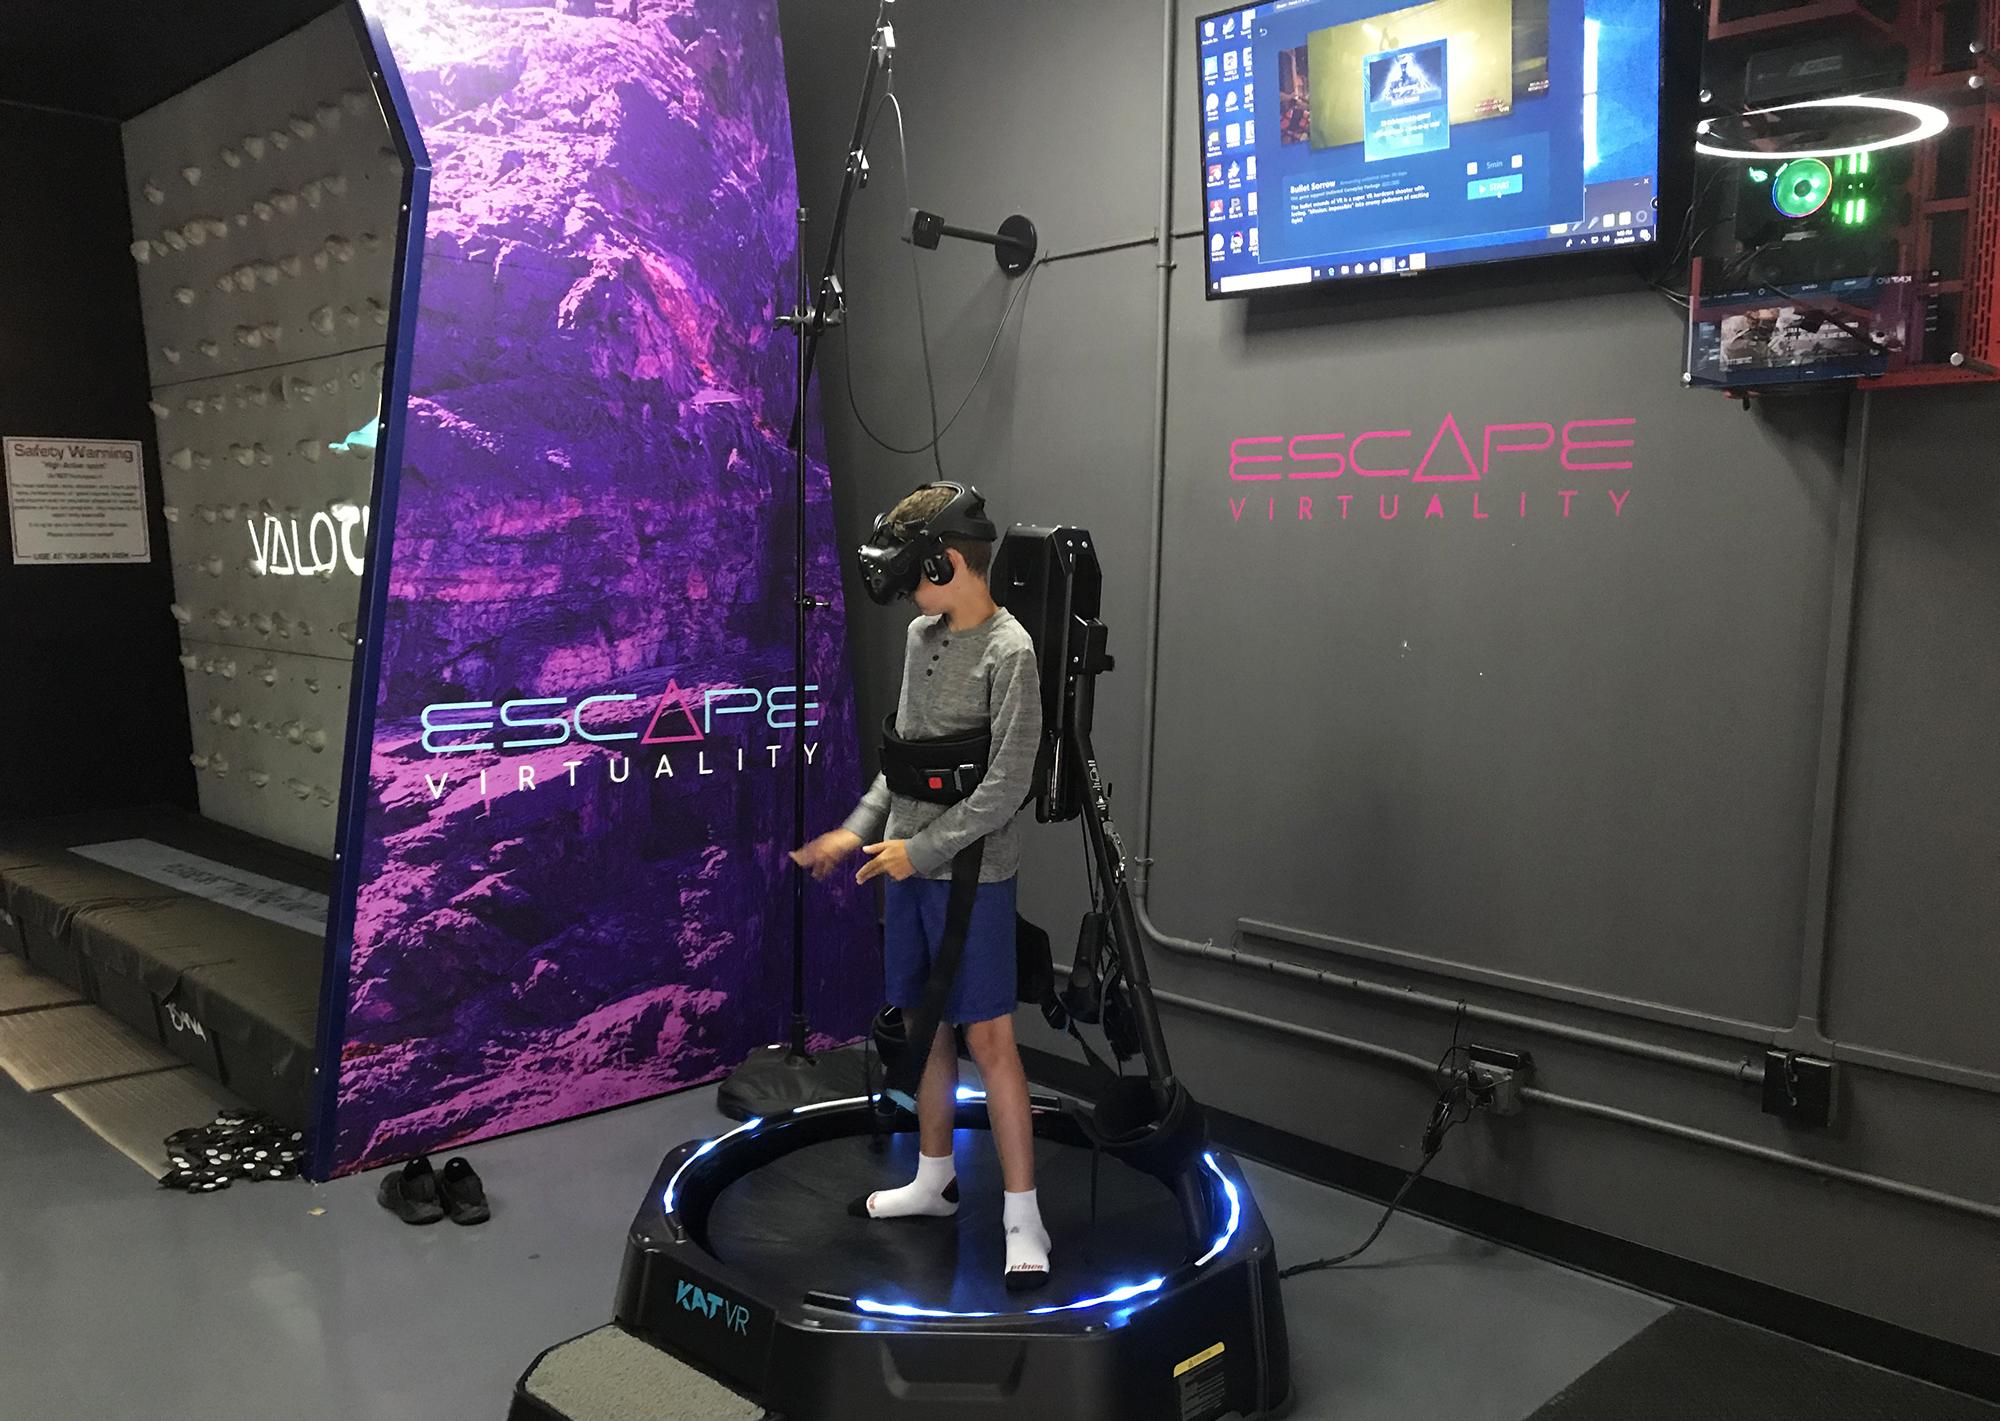 escape virtuality virtual reality arcades